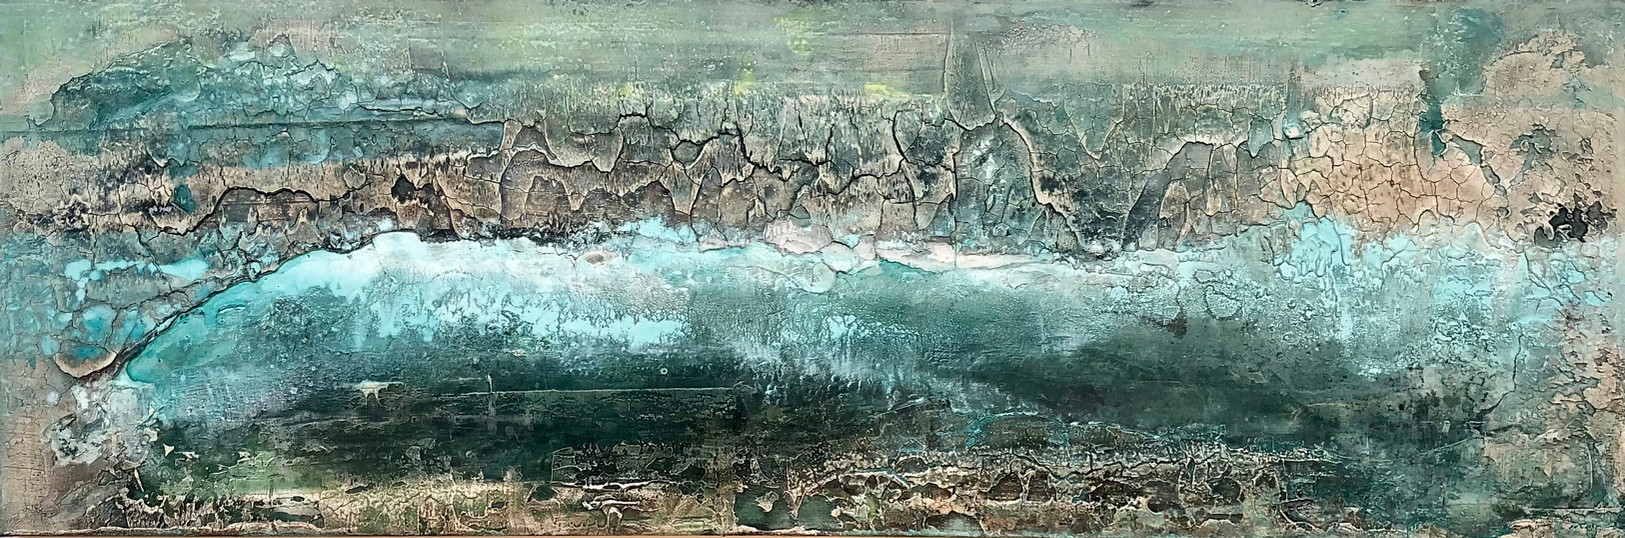 Coastline IV, 180 x 60 cm